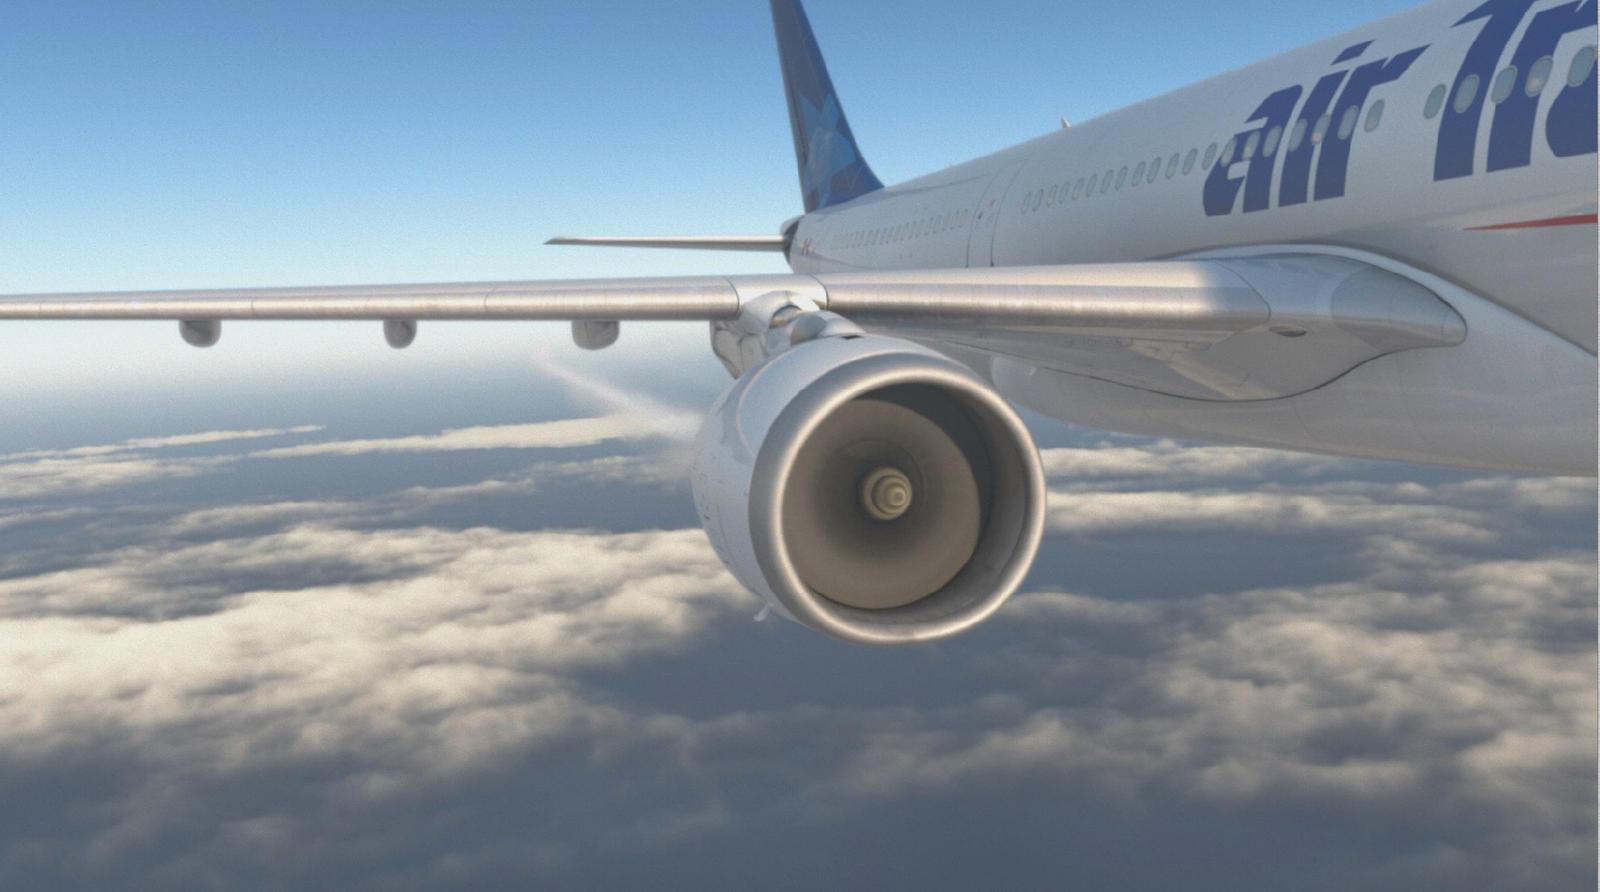 Airbus A330 in flight by Sin-Vraal on DeviantArt